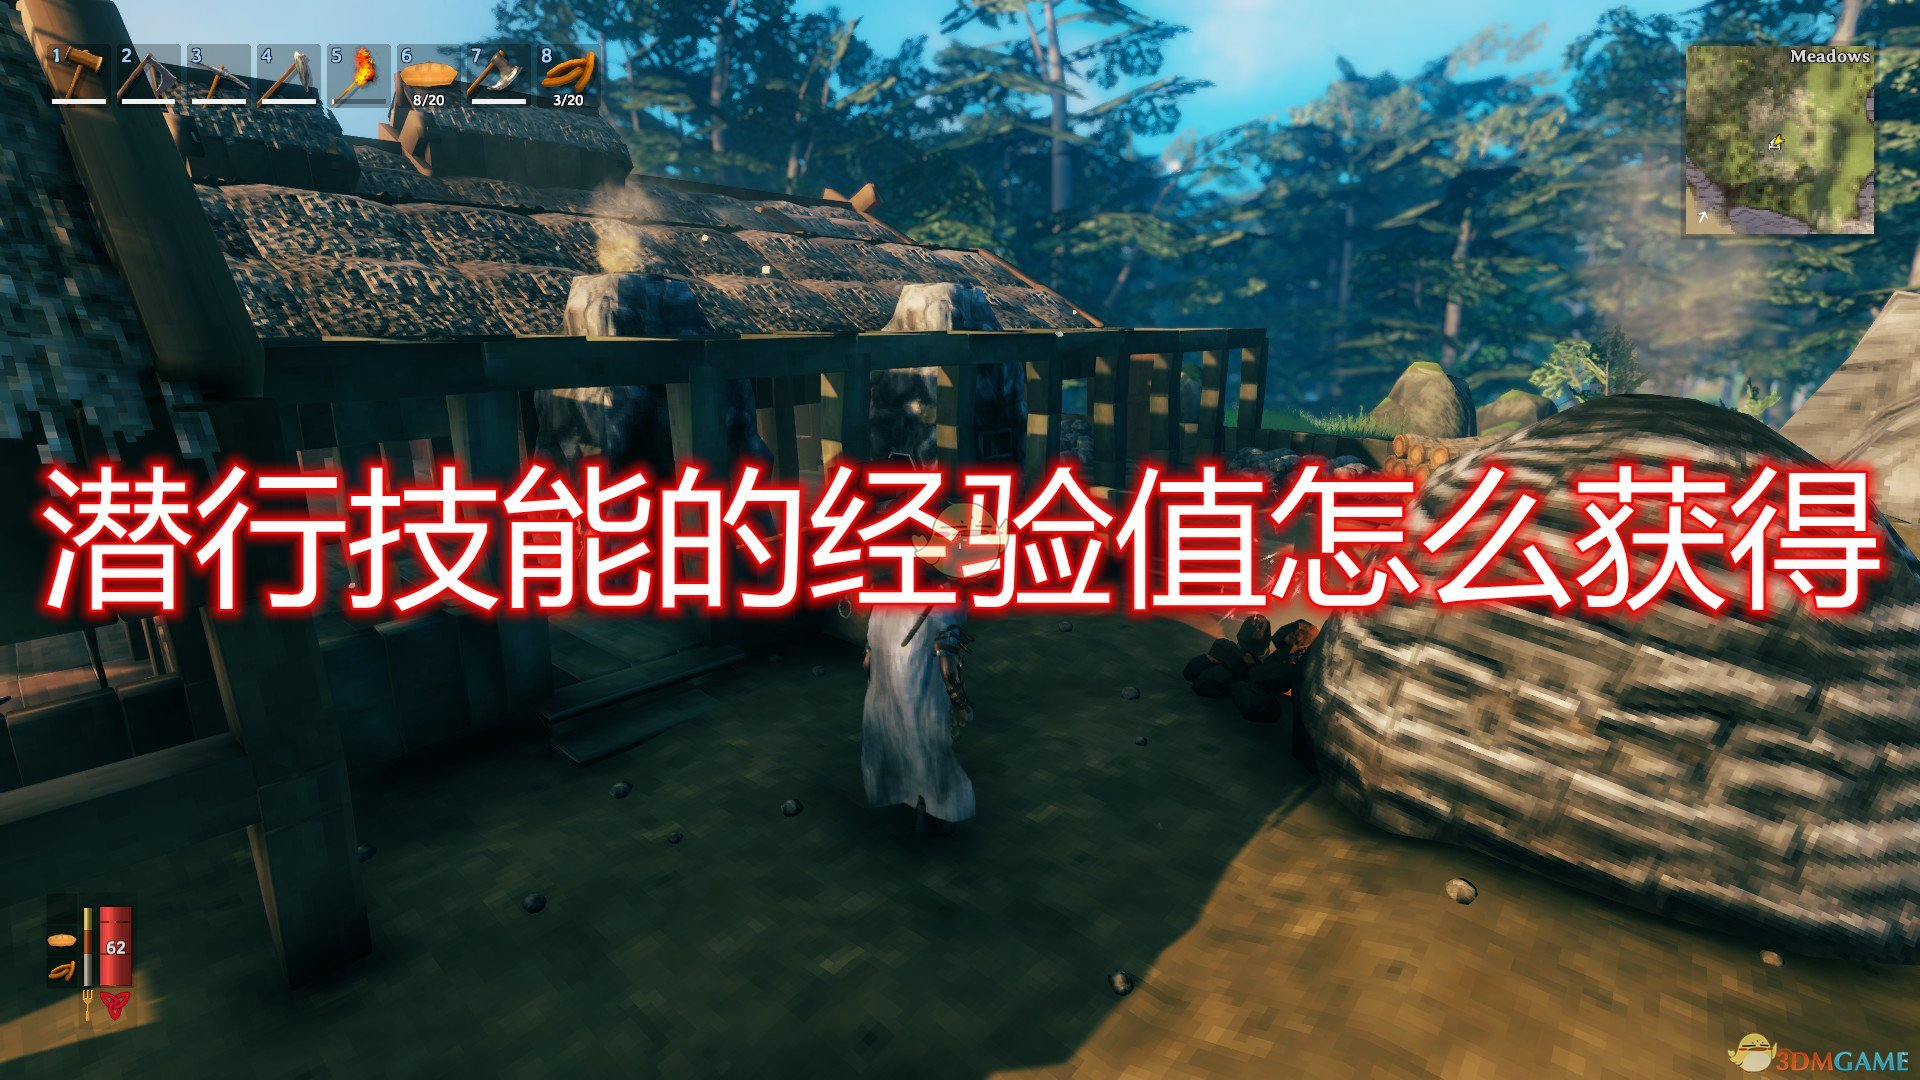 《Valheim:英靈神殿》潛行技能經驗值獲取機制介紹